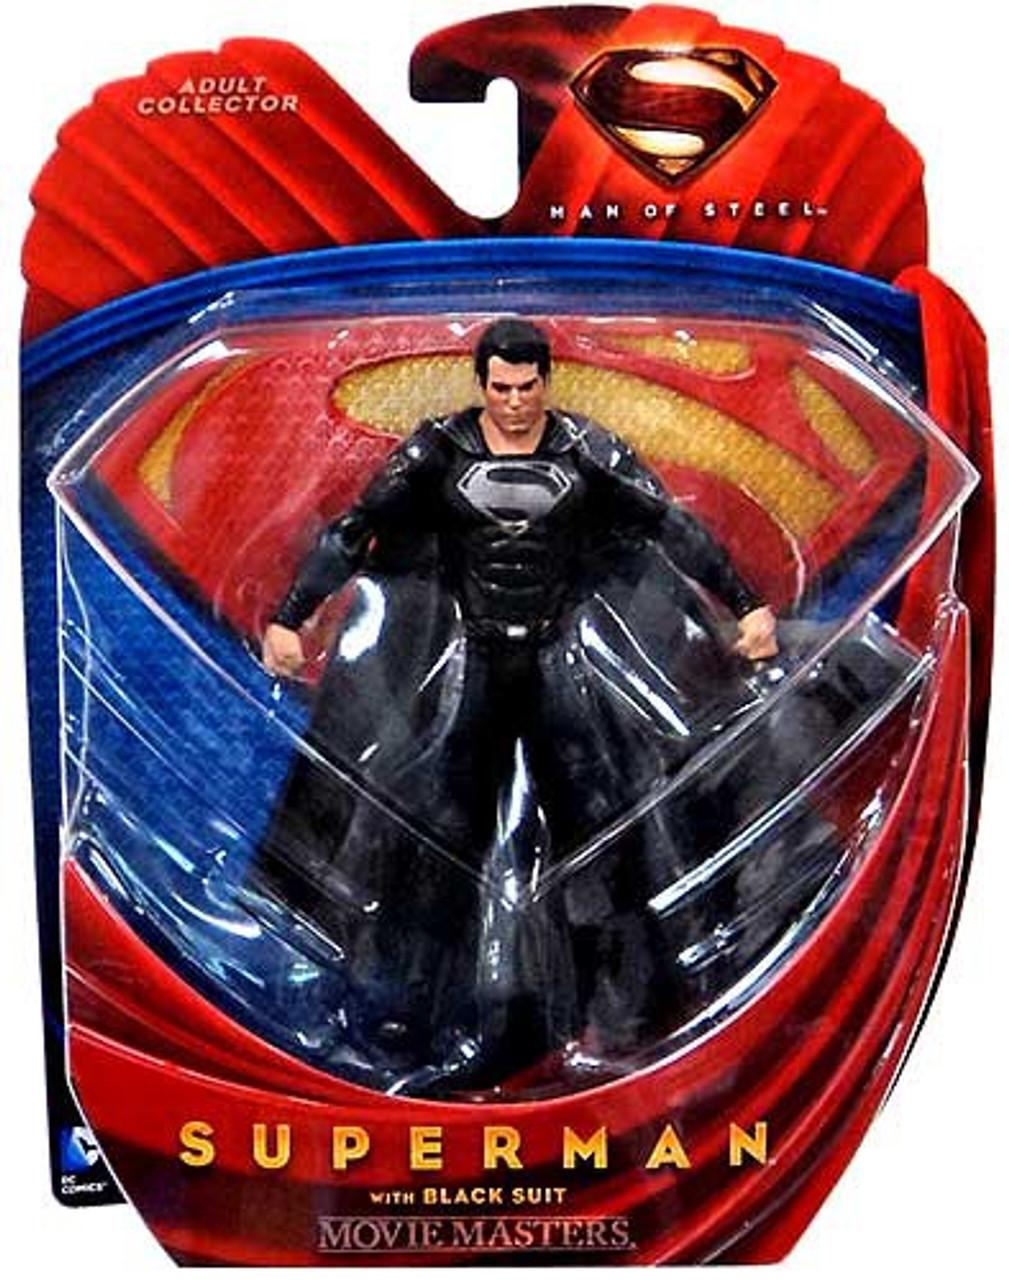 Man of Steel Movie Masters Superman Action Figure [Black Suit]